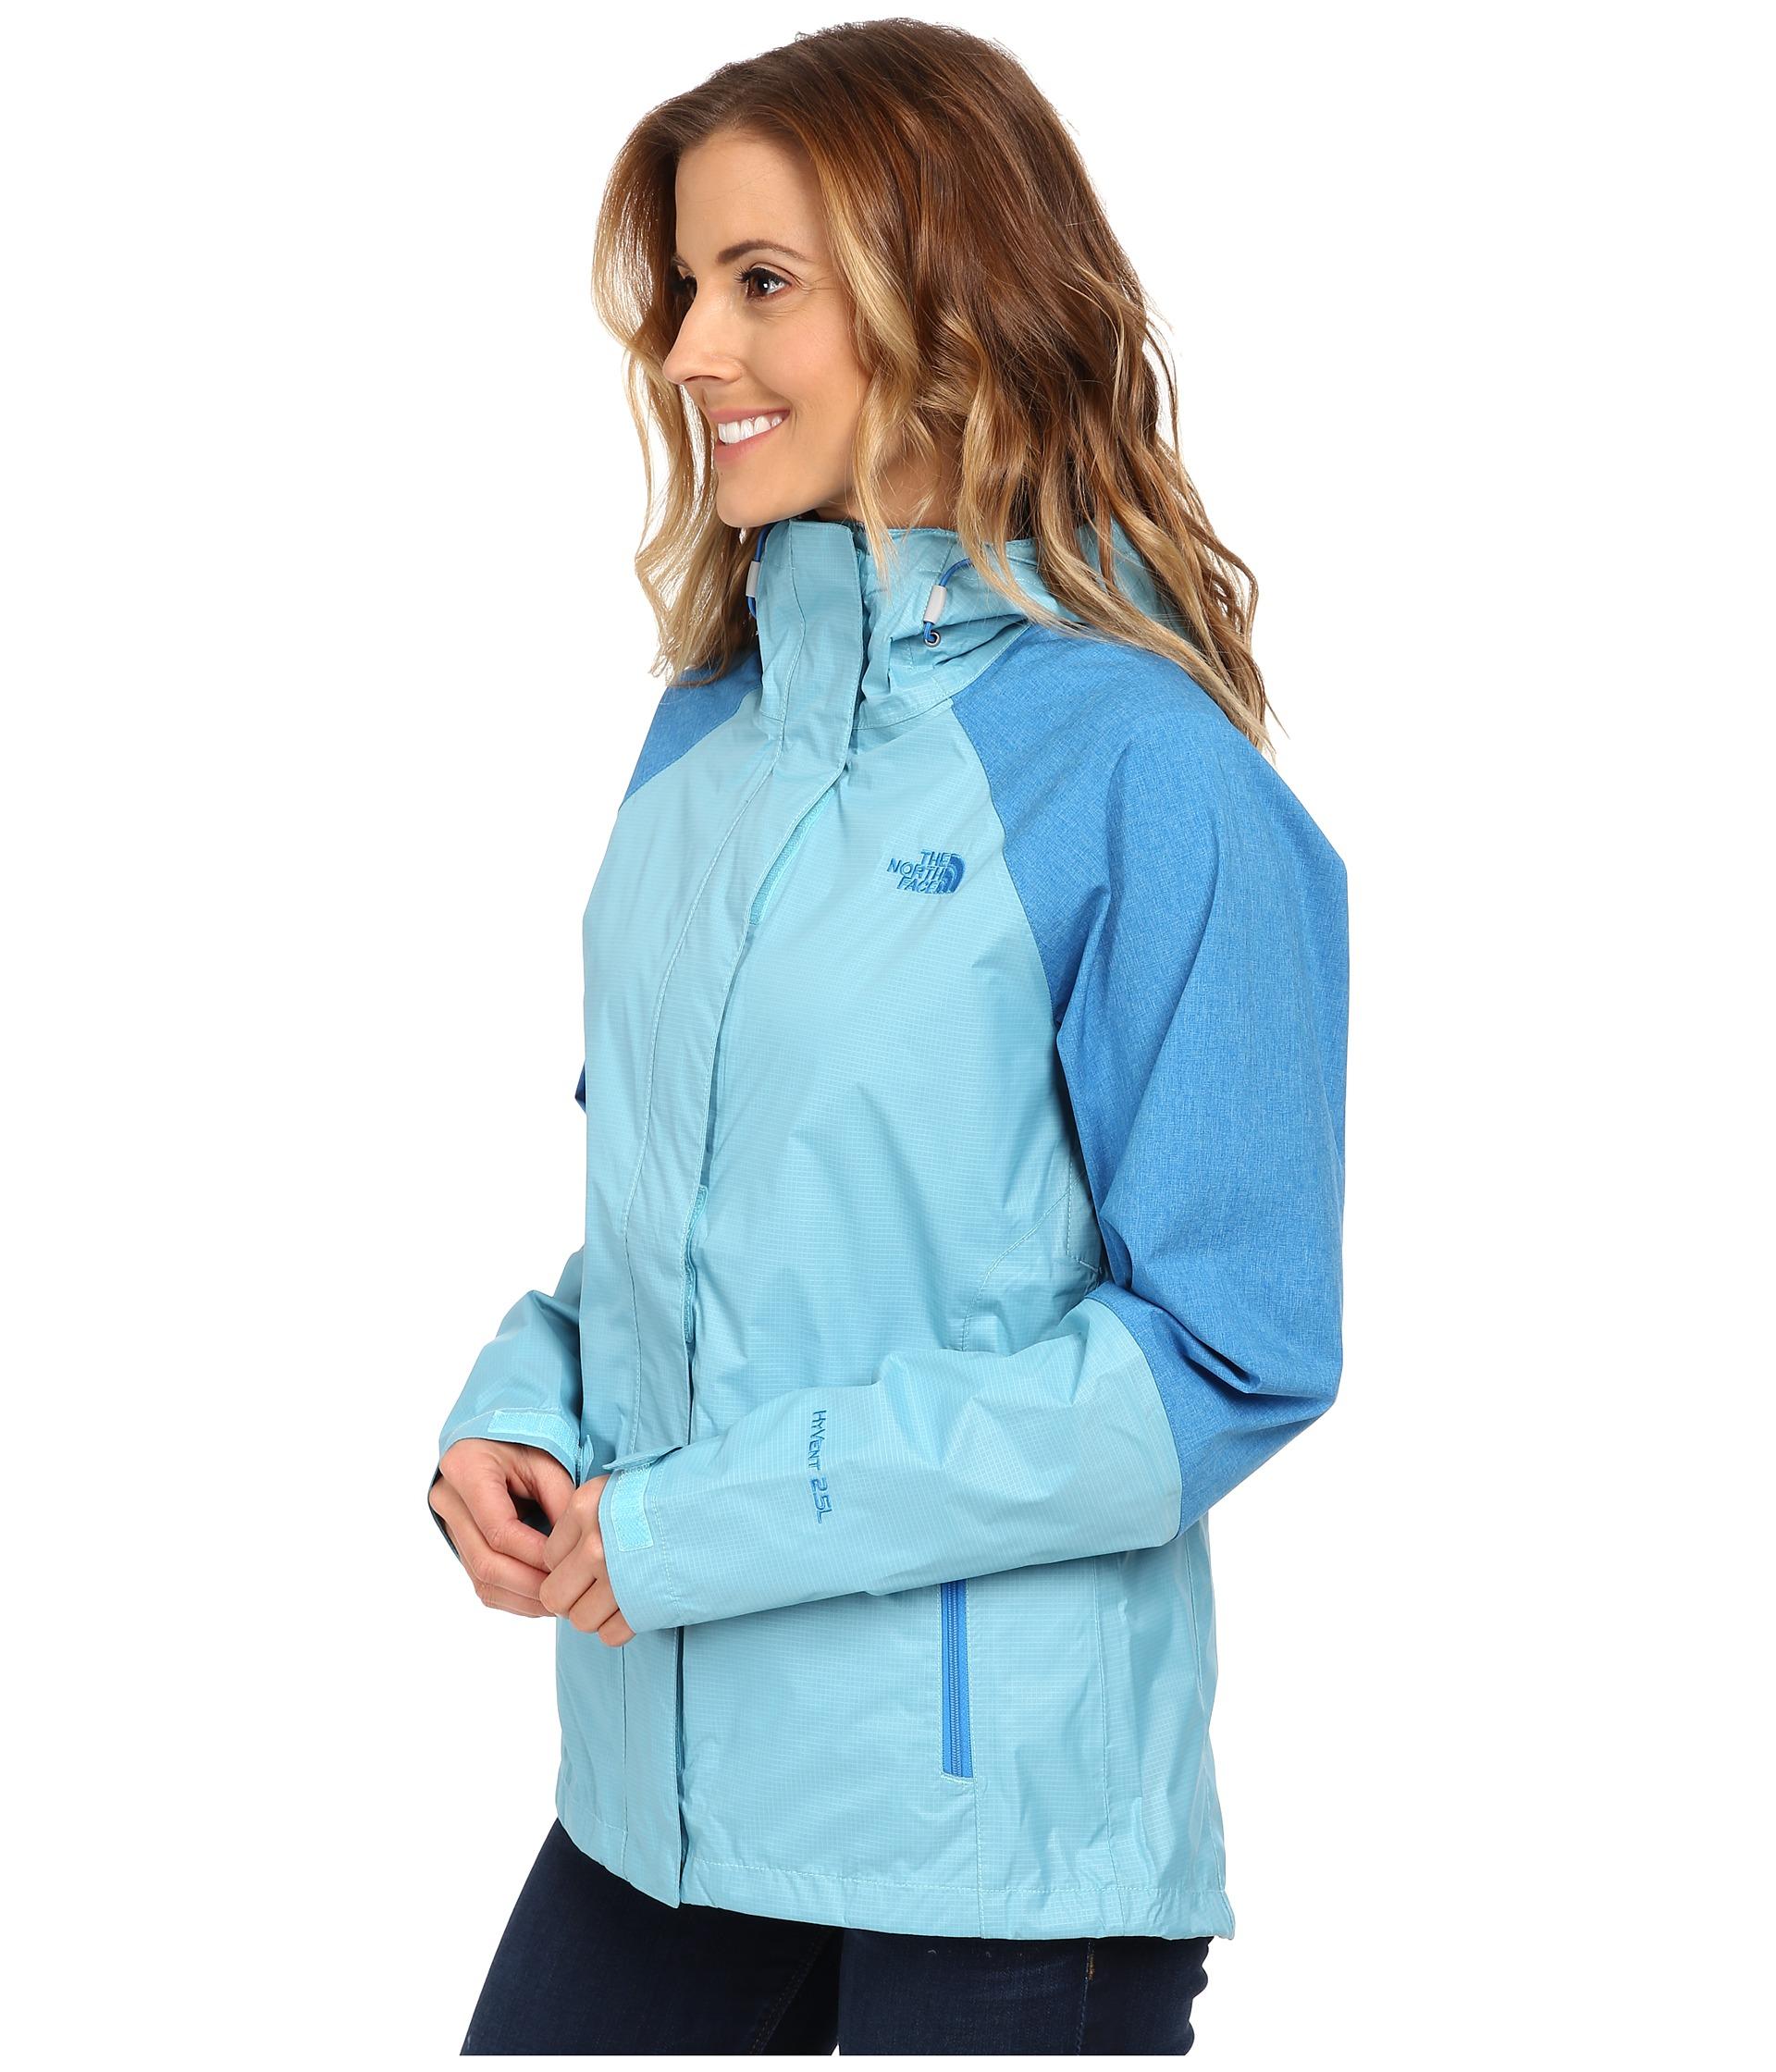 f5b3ef4c7 Women's Blue Venture Hybrid Jacket